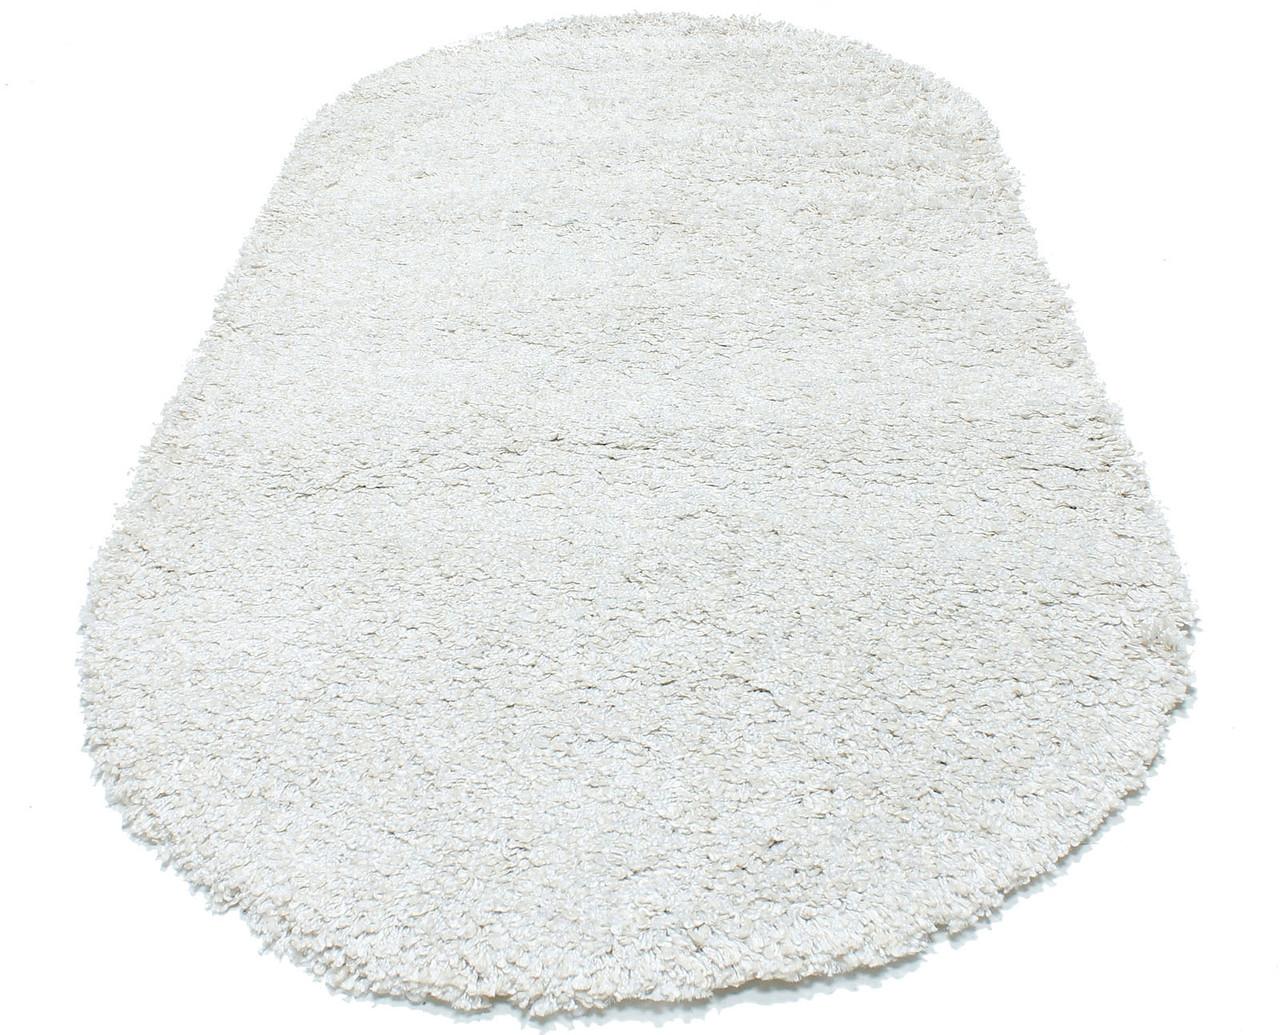 Коврик с высоким ворсом NEW MERIDIAN 3 0001-01 0,8Х1,5 СЕРЫЙ овал